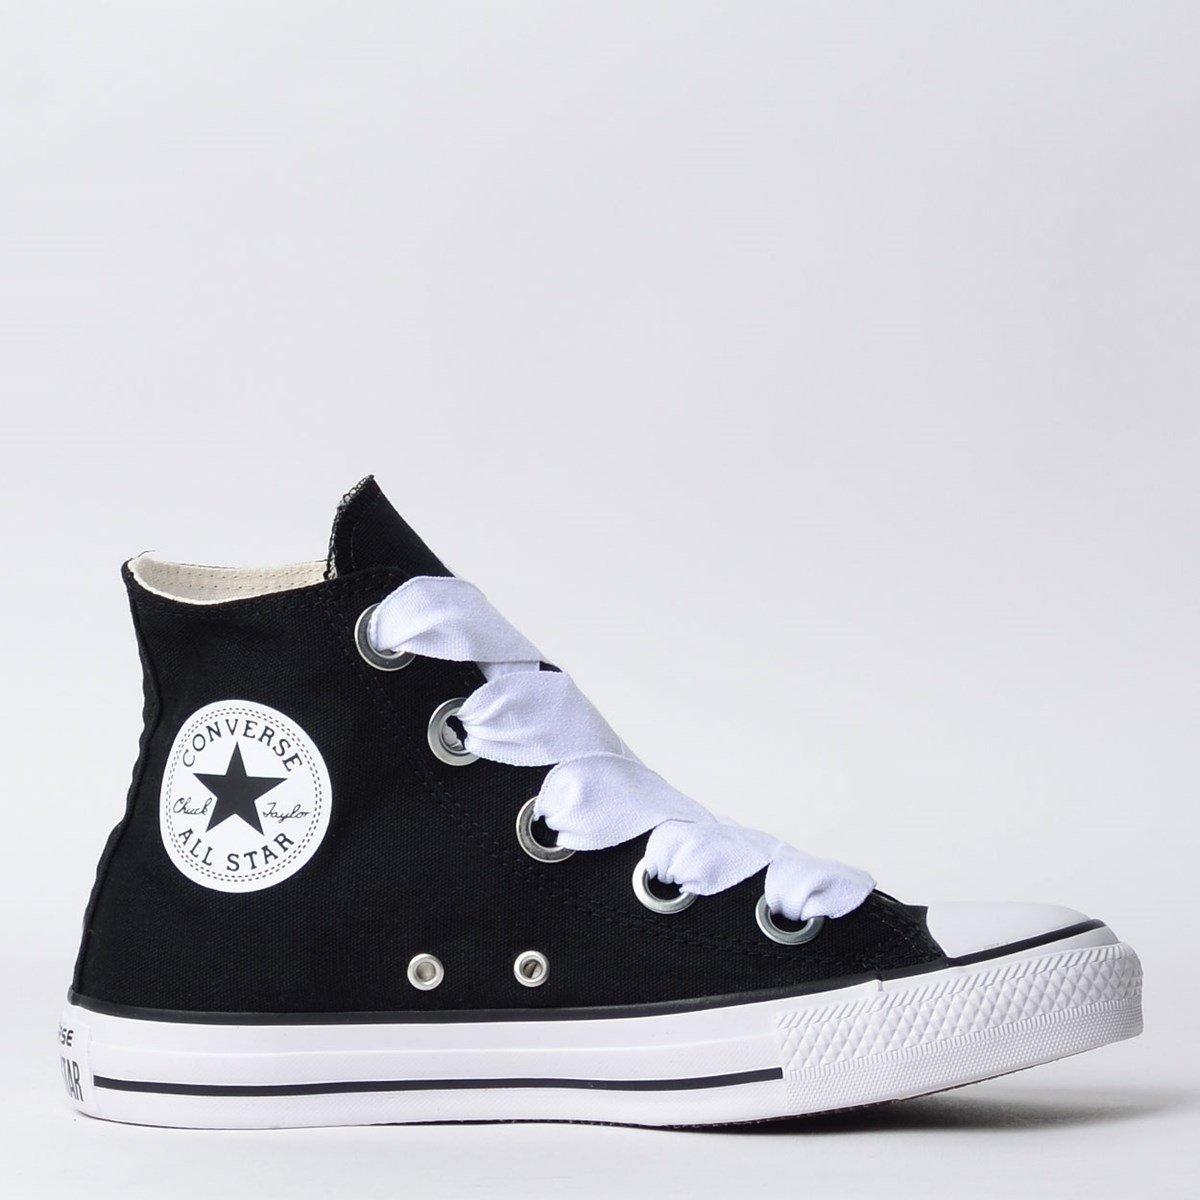 Tênis Converse Chuck Taylor All Star Big Eyelet H - Compre Agora ... 0a0629bd06ab5